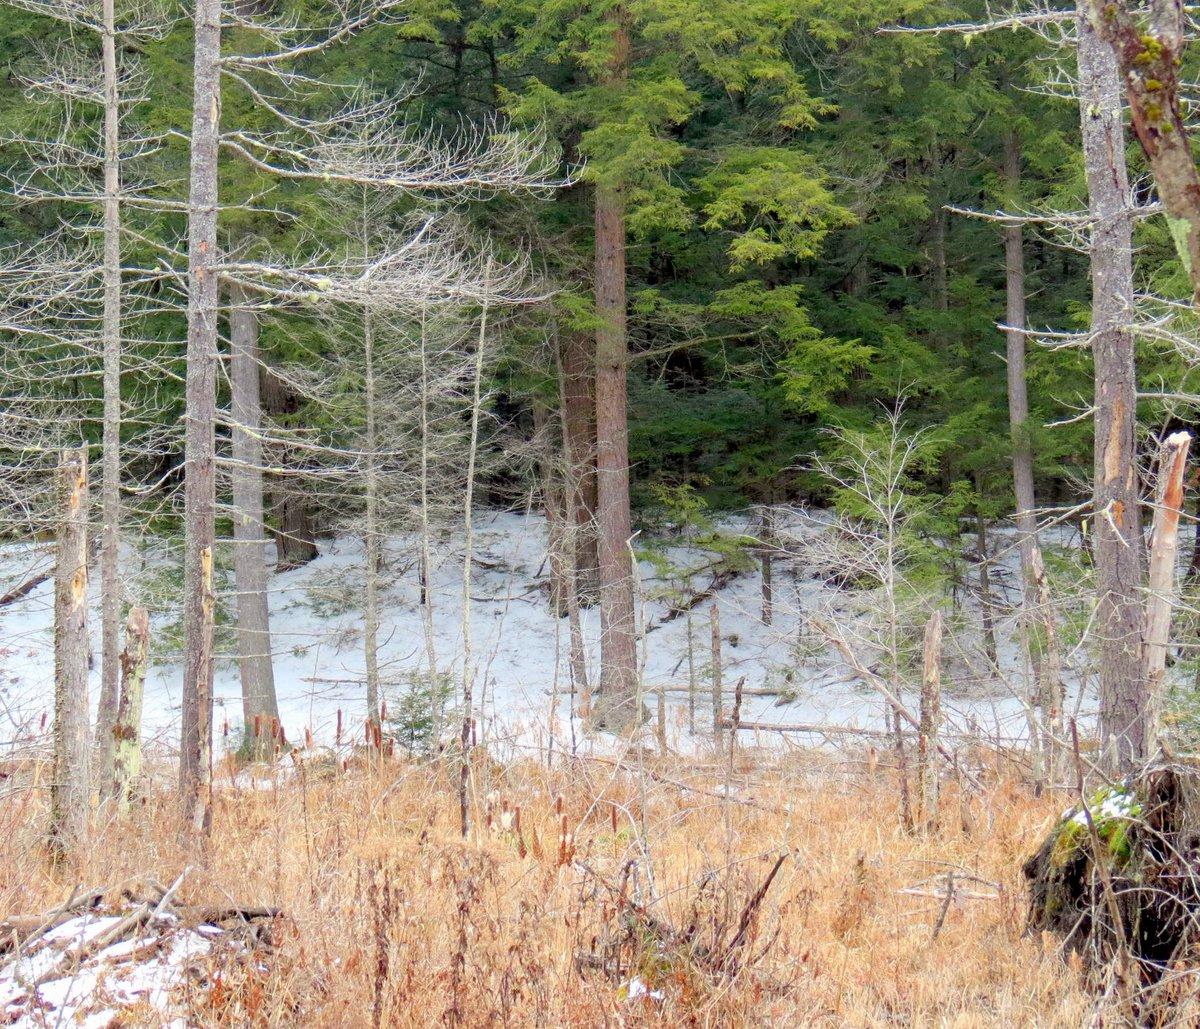 2. Beaver Swamp